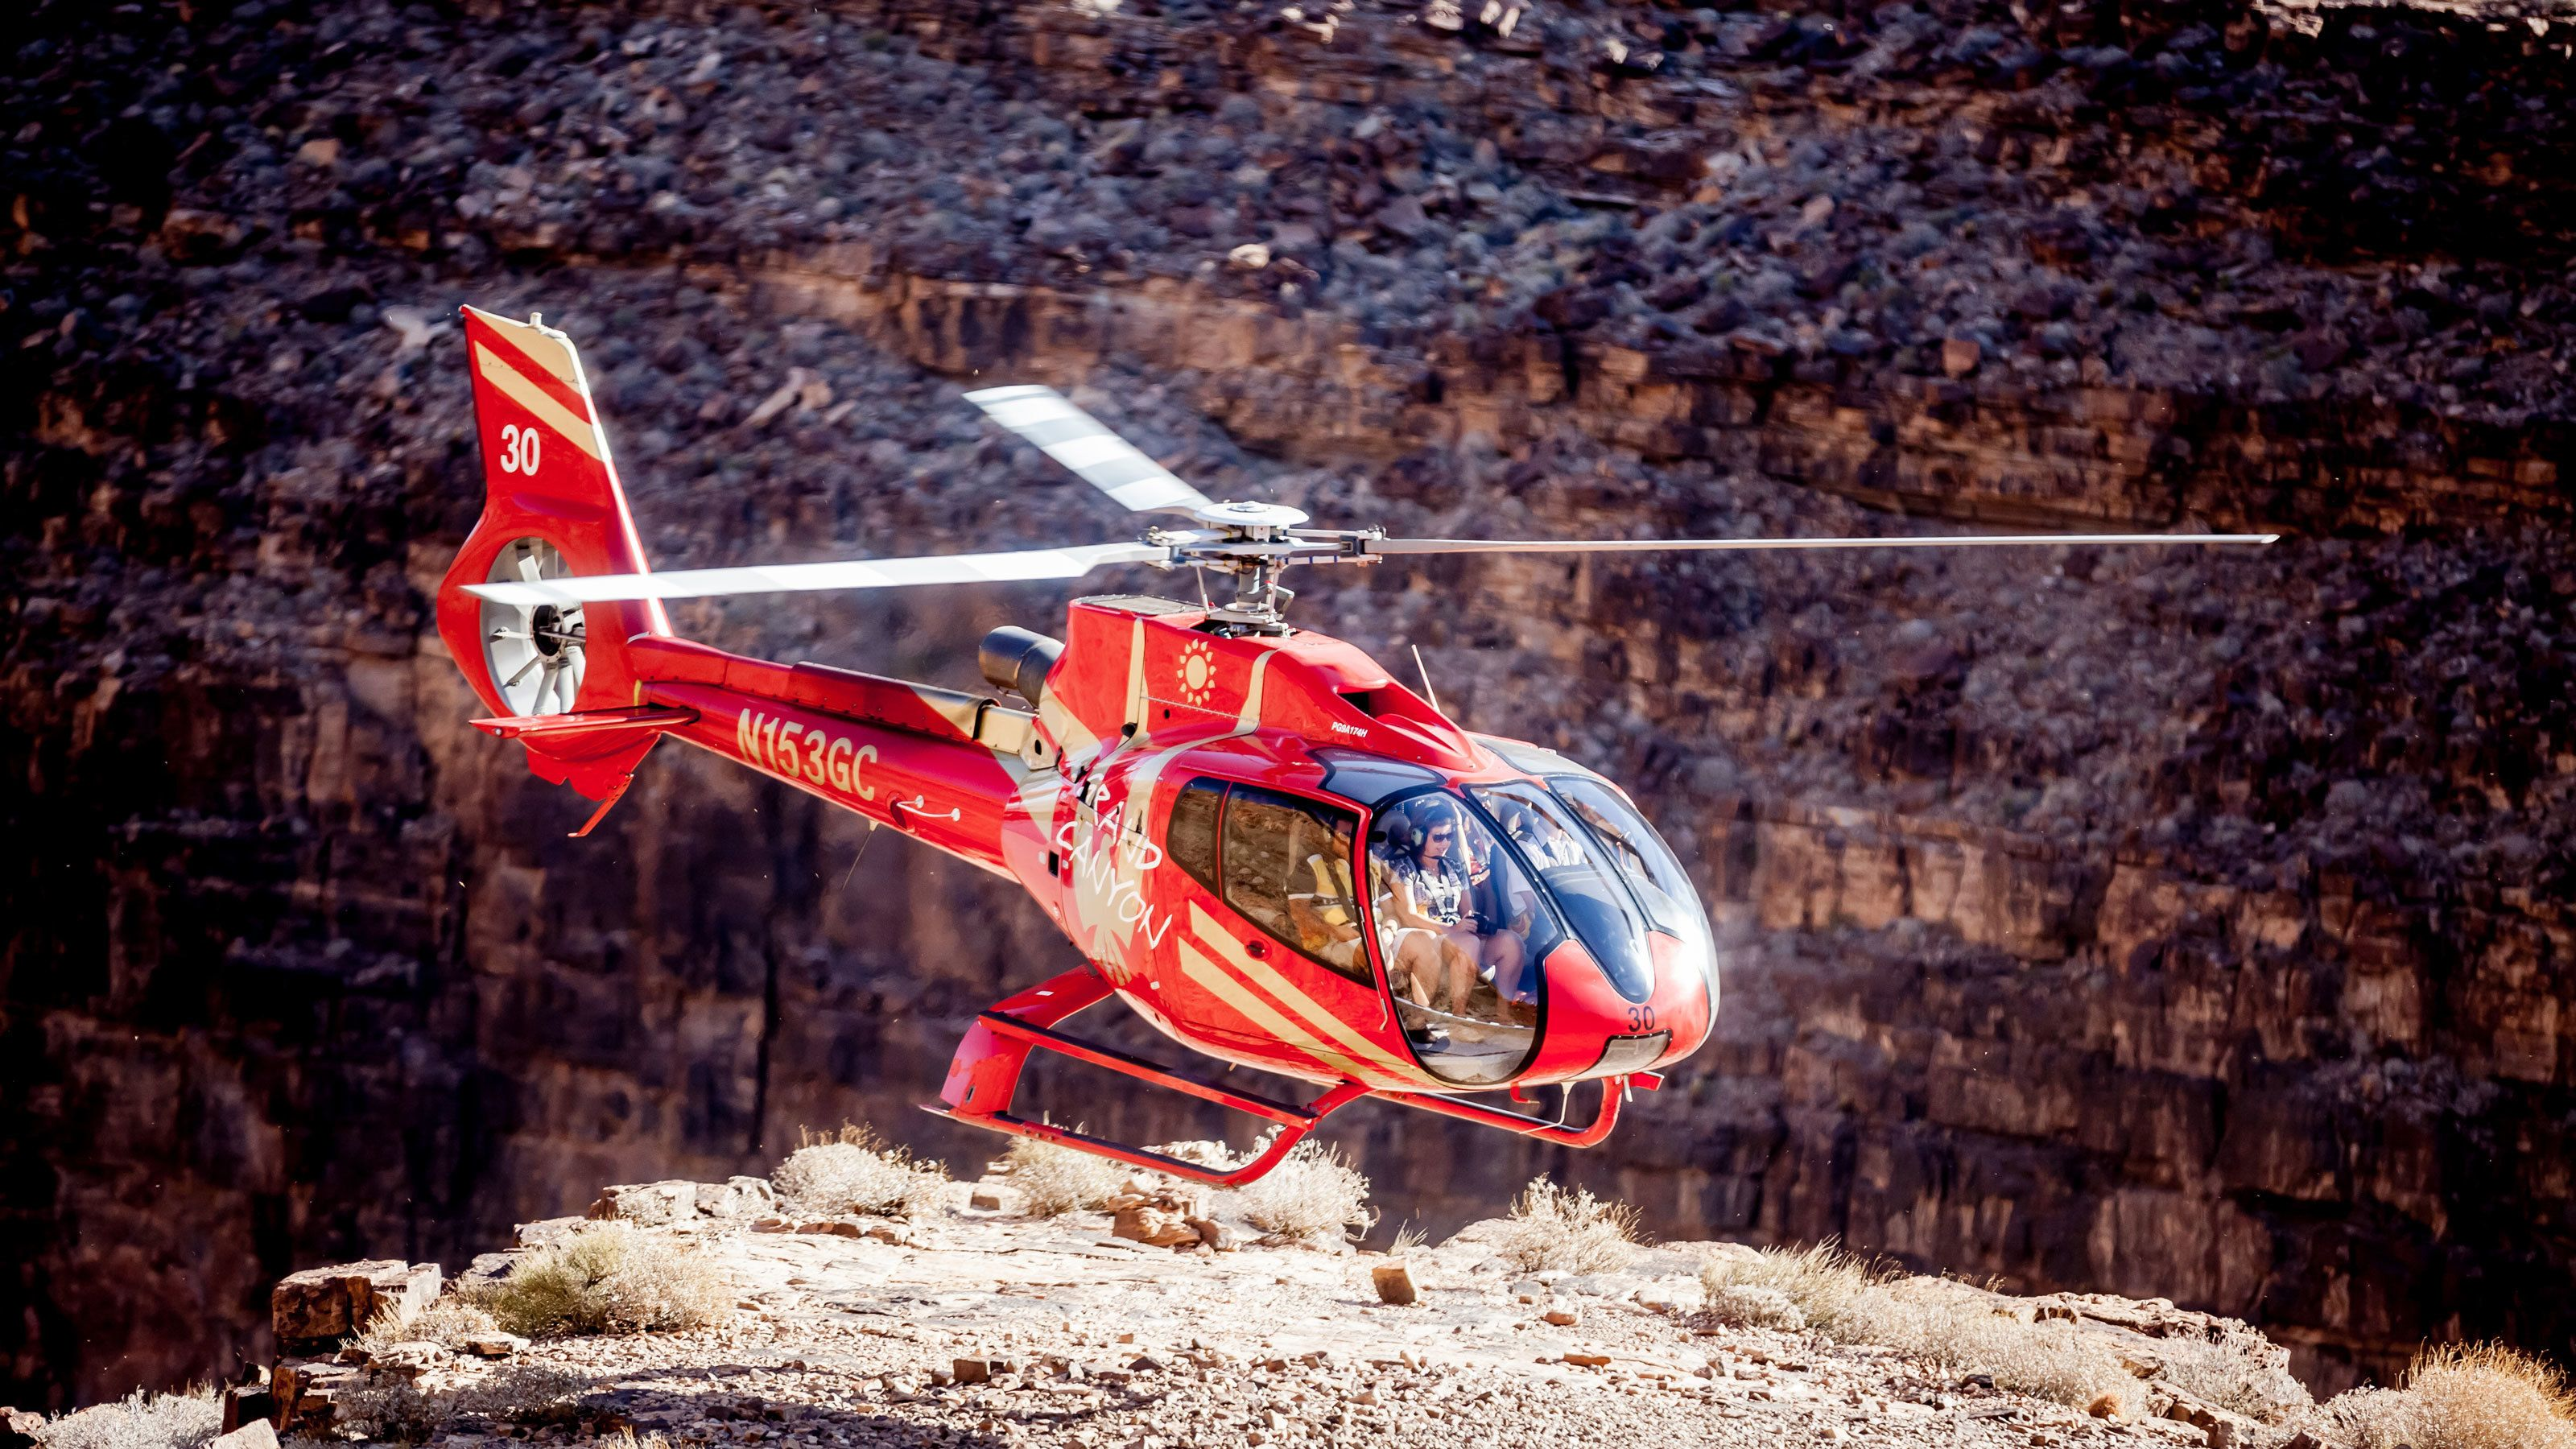 Grand Celebration West Rim Helicopter Landing Tour